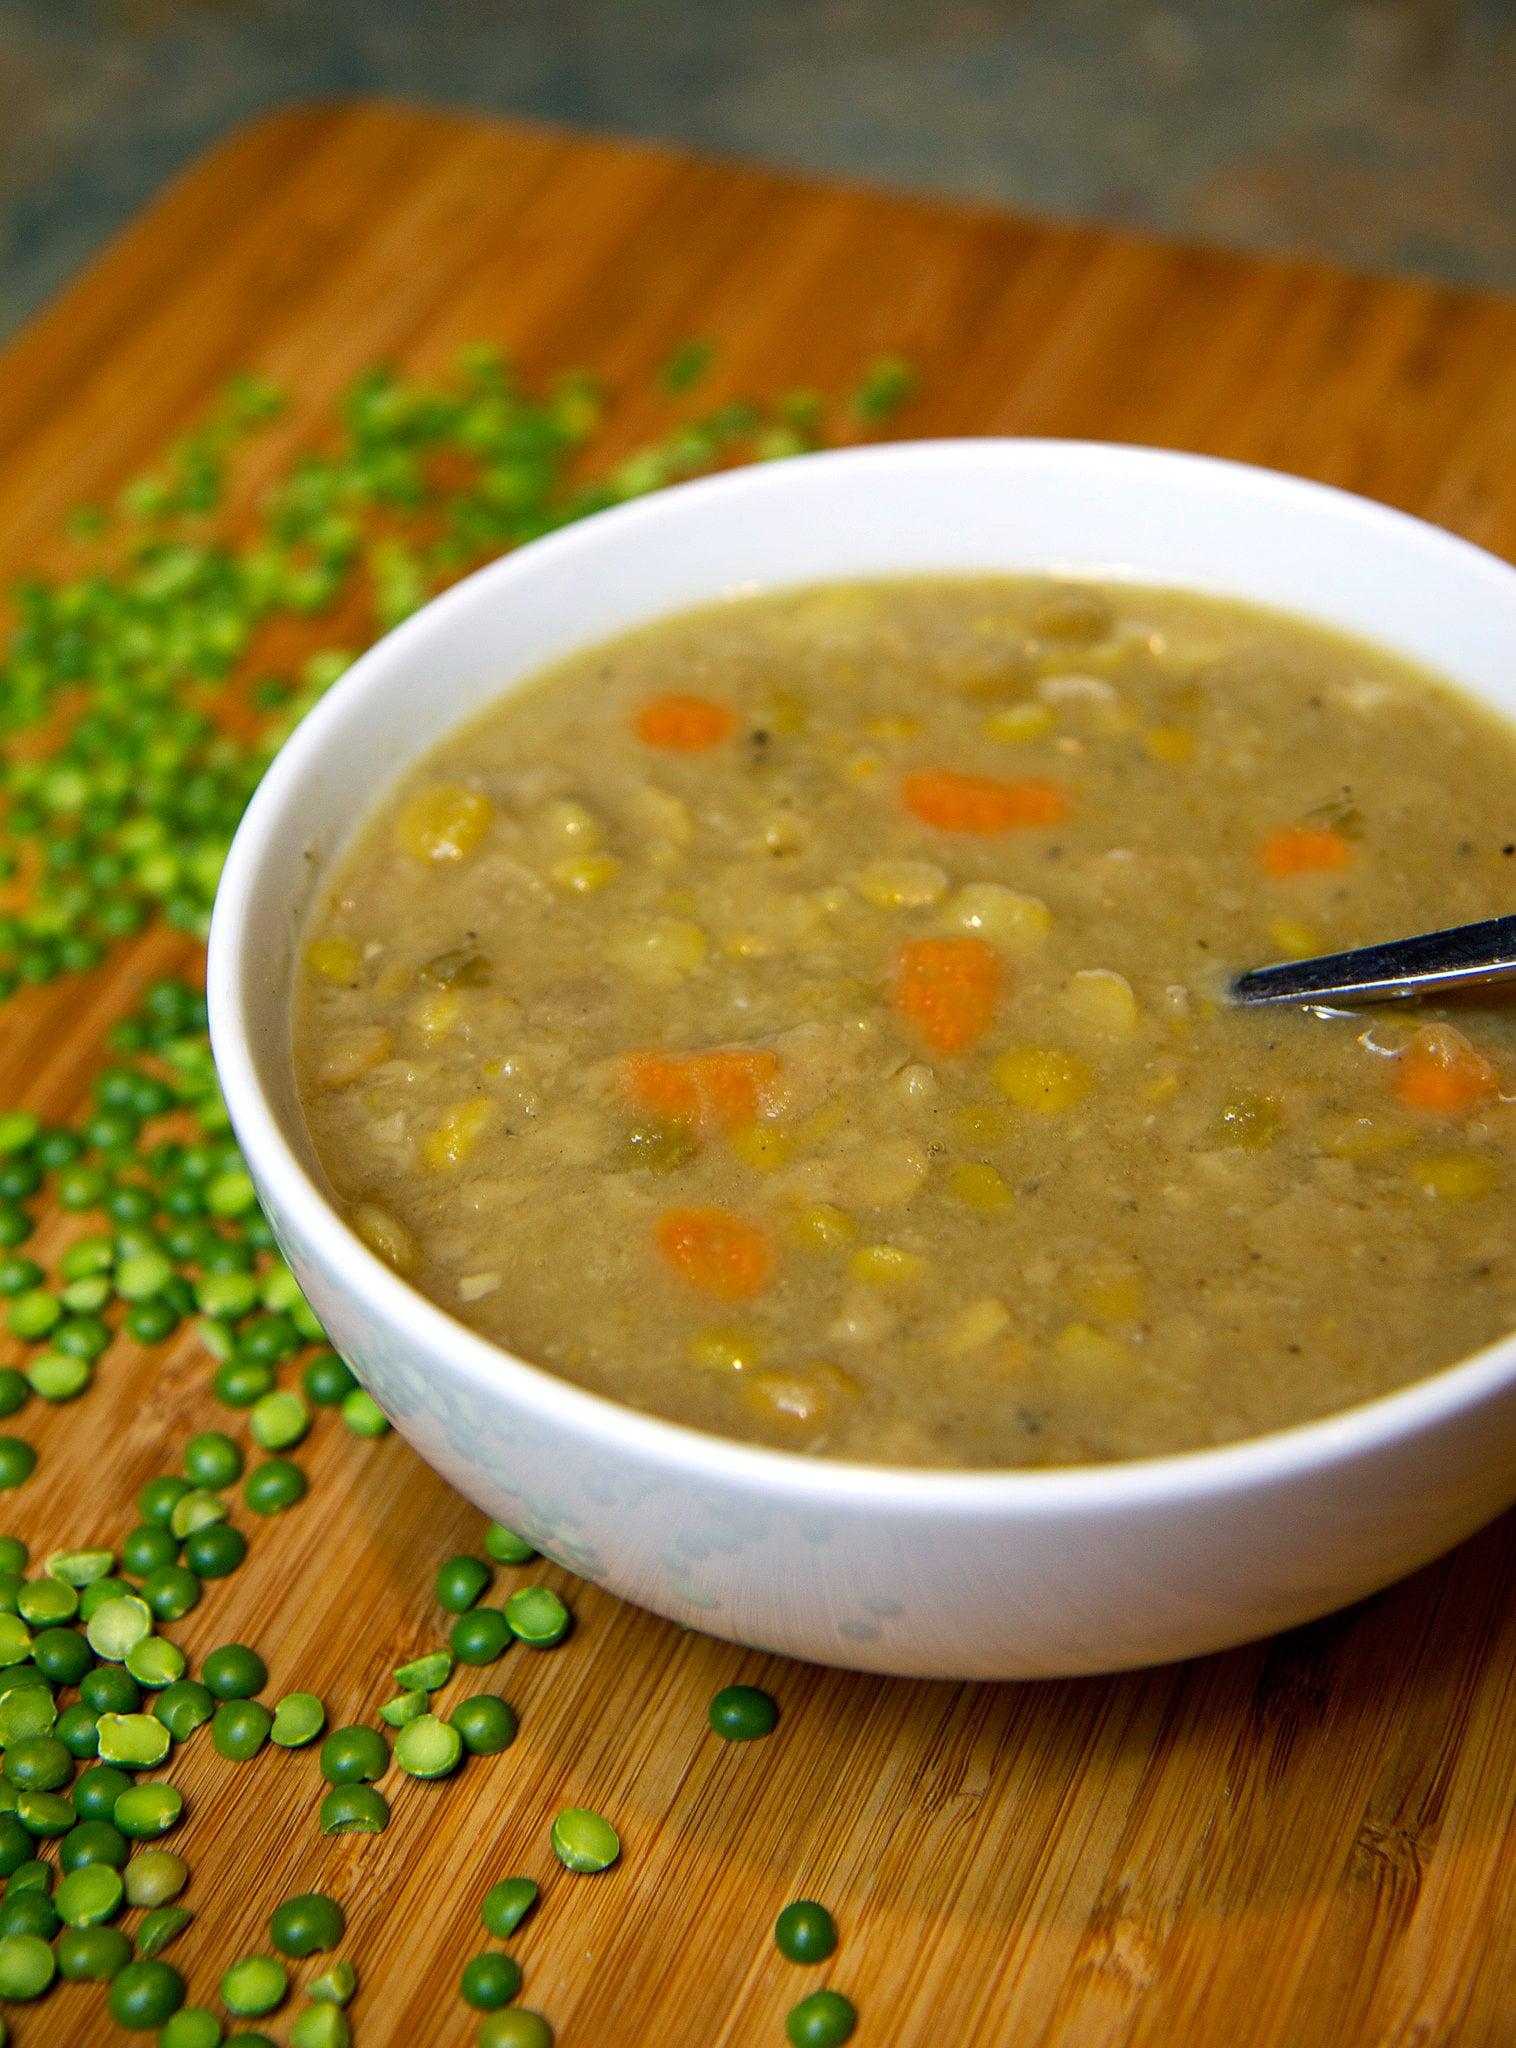 Sunday: Vegan Split Pea and Sweet Potato Soup